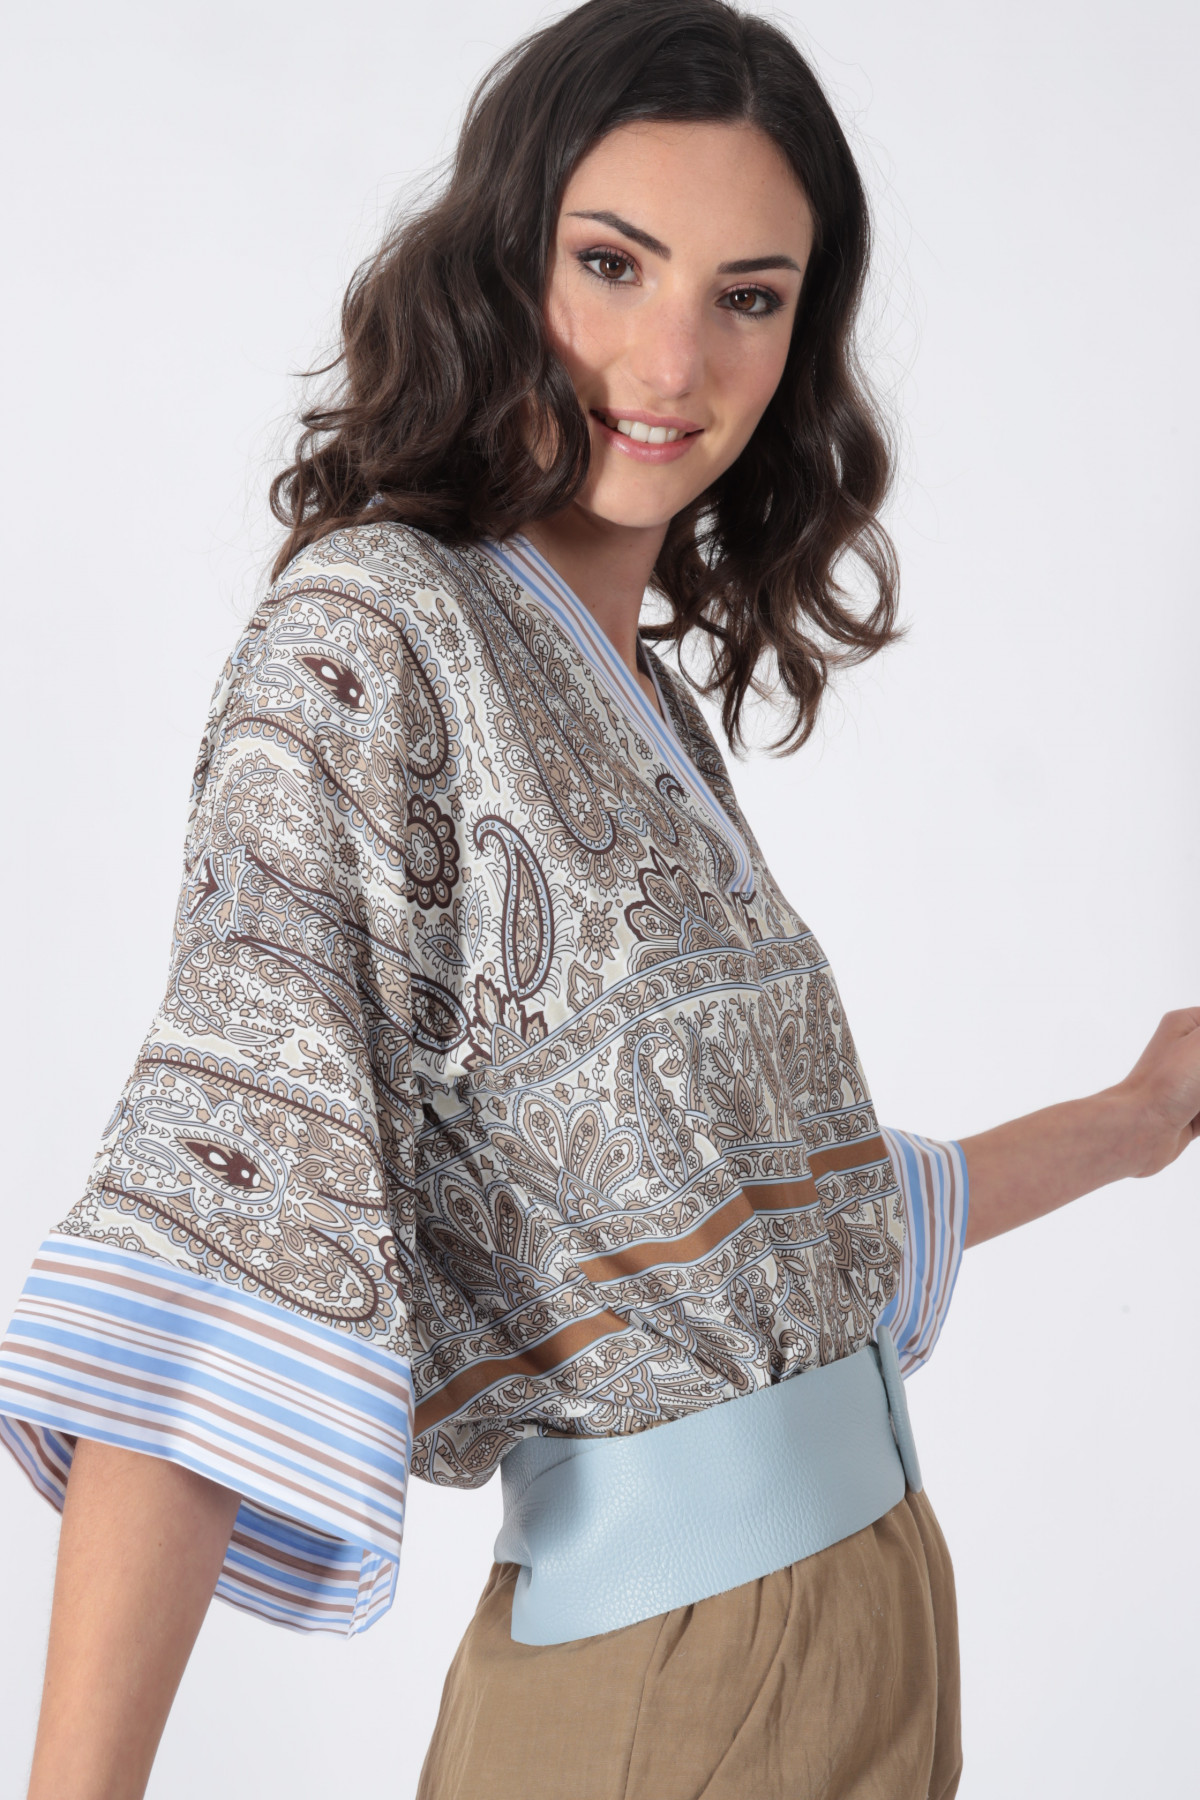 Kimono Shirt in Cashmere Fantasy Print and Pinstripe Profiles